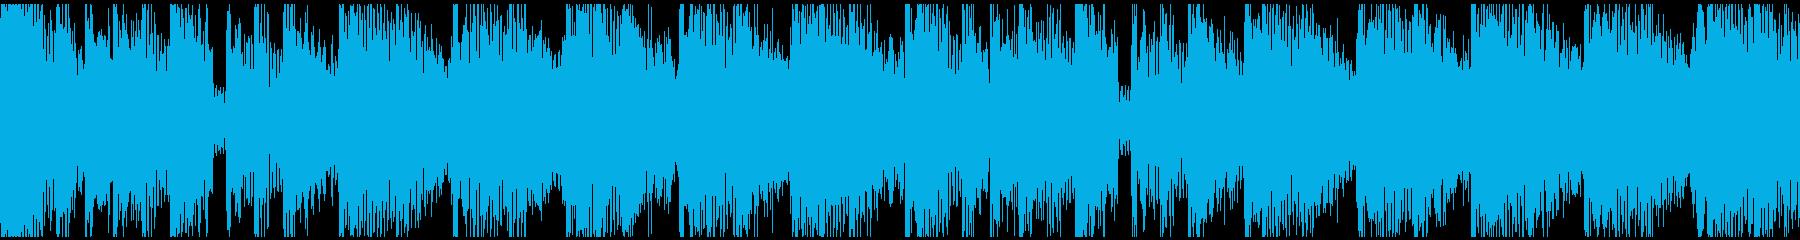 bpm158Loopの再生済みの波形